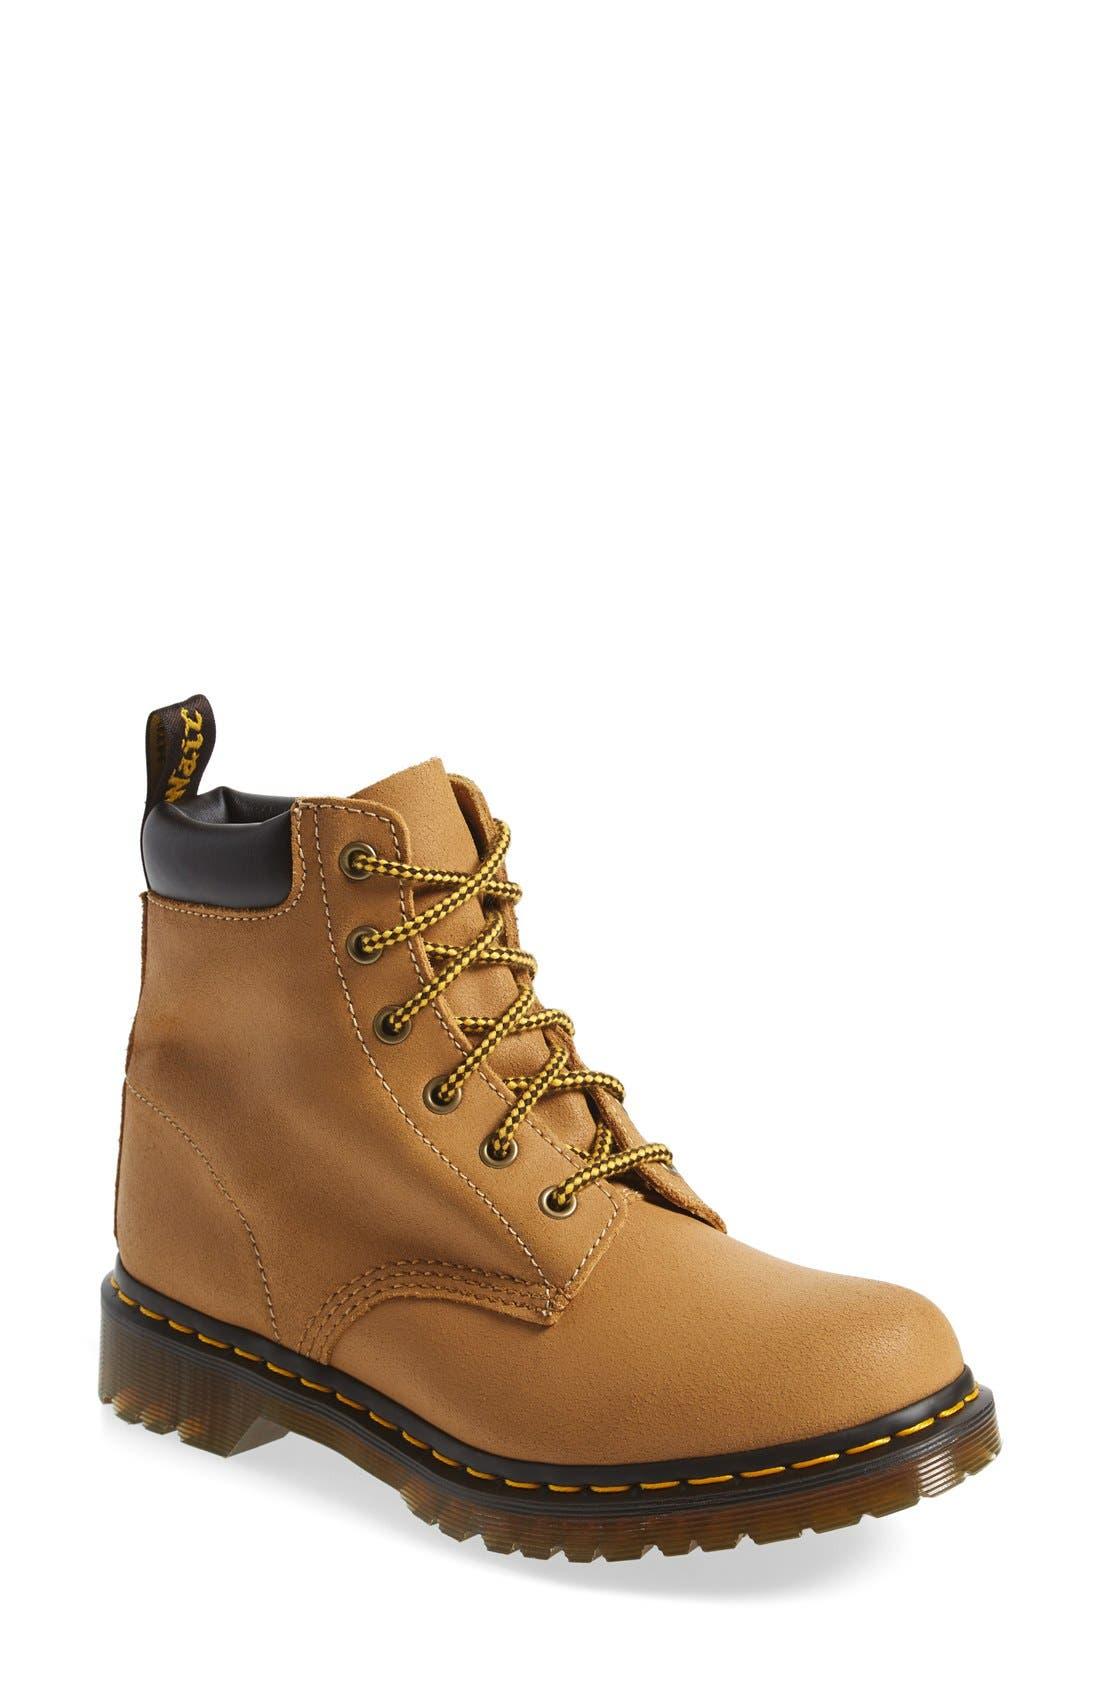 Main Image - Dr. Martens '939' Boot (Women)